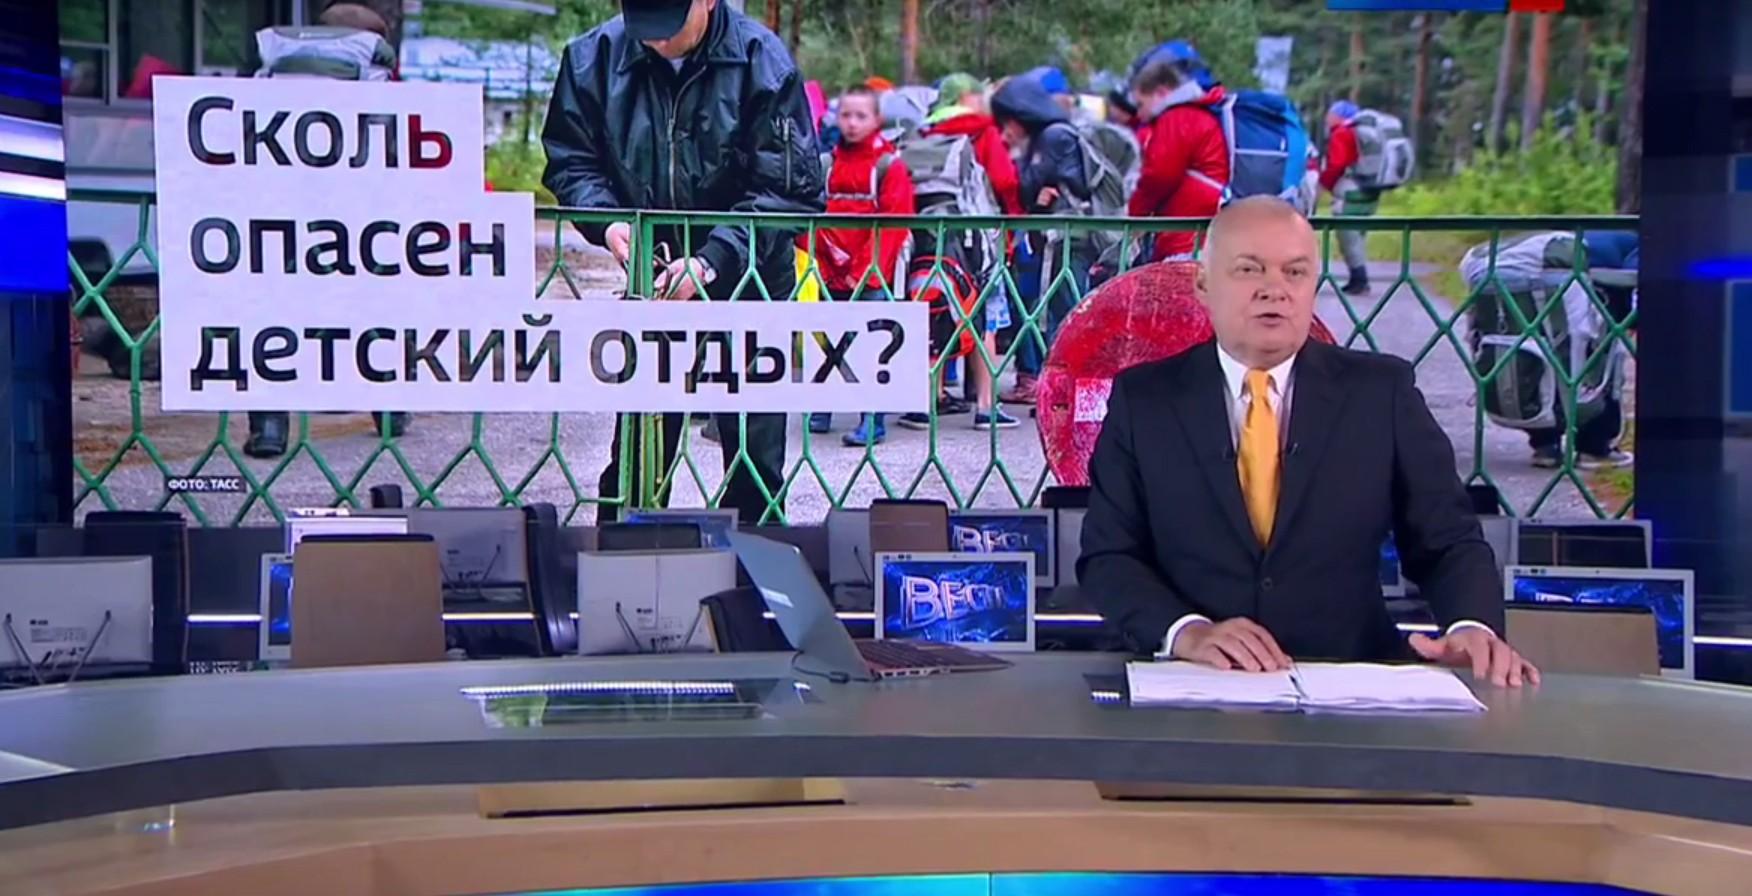 Целка україке відео 7 фотография